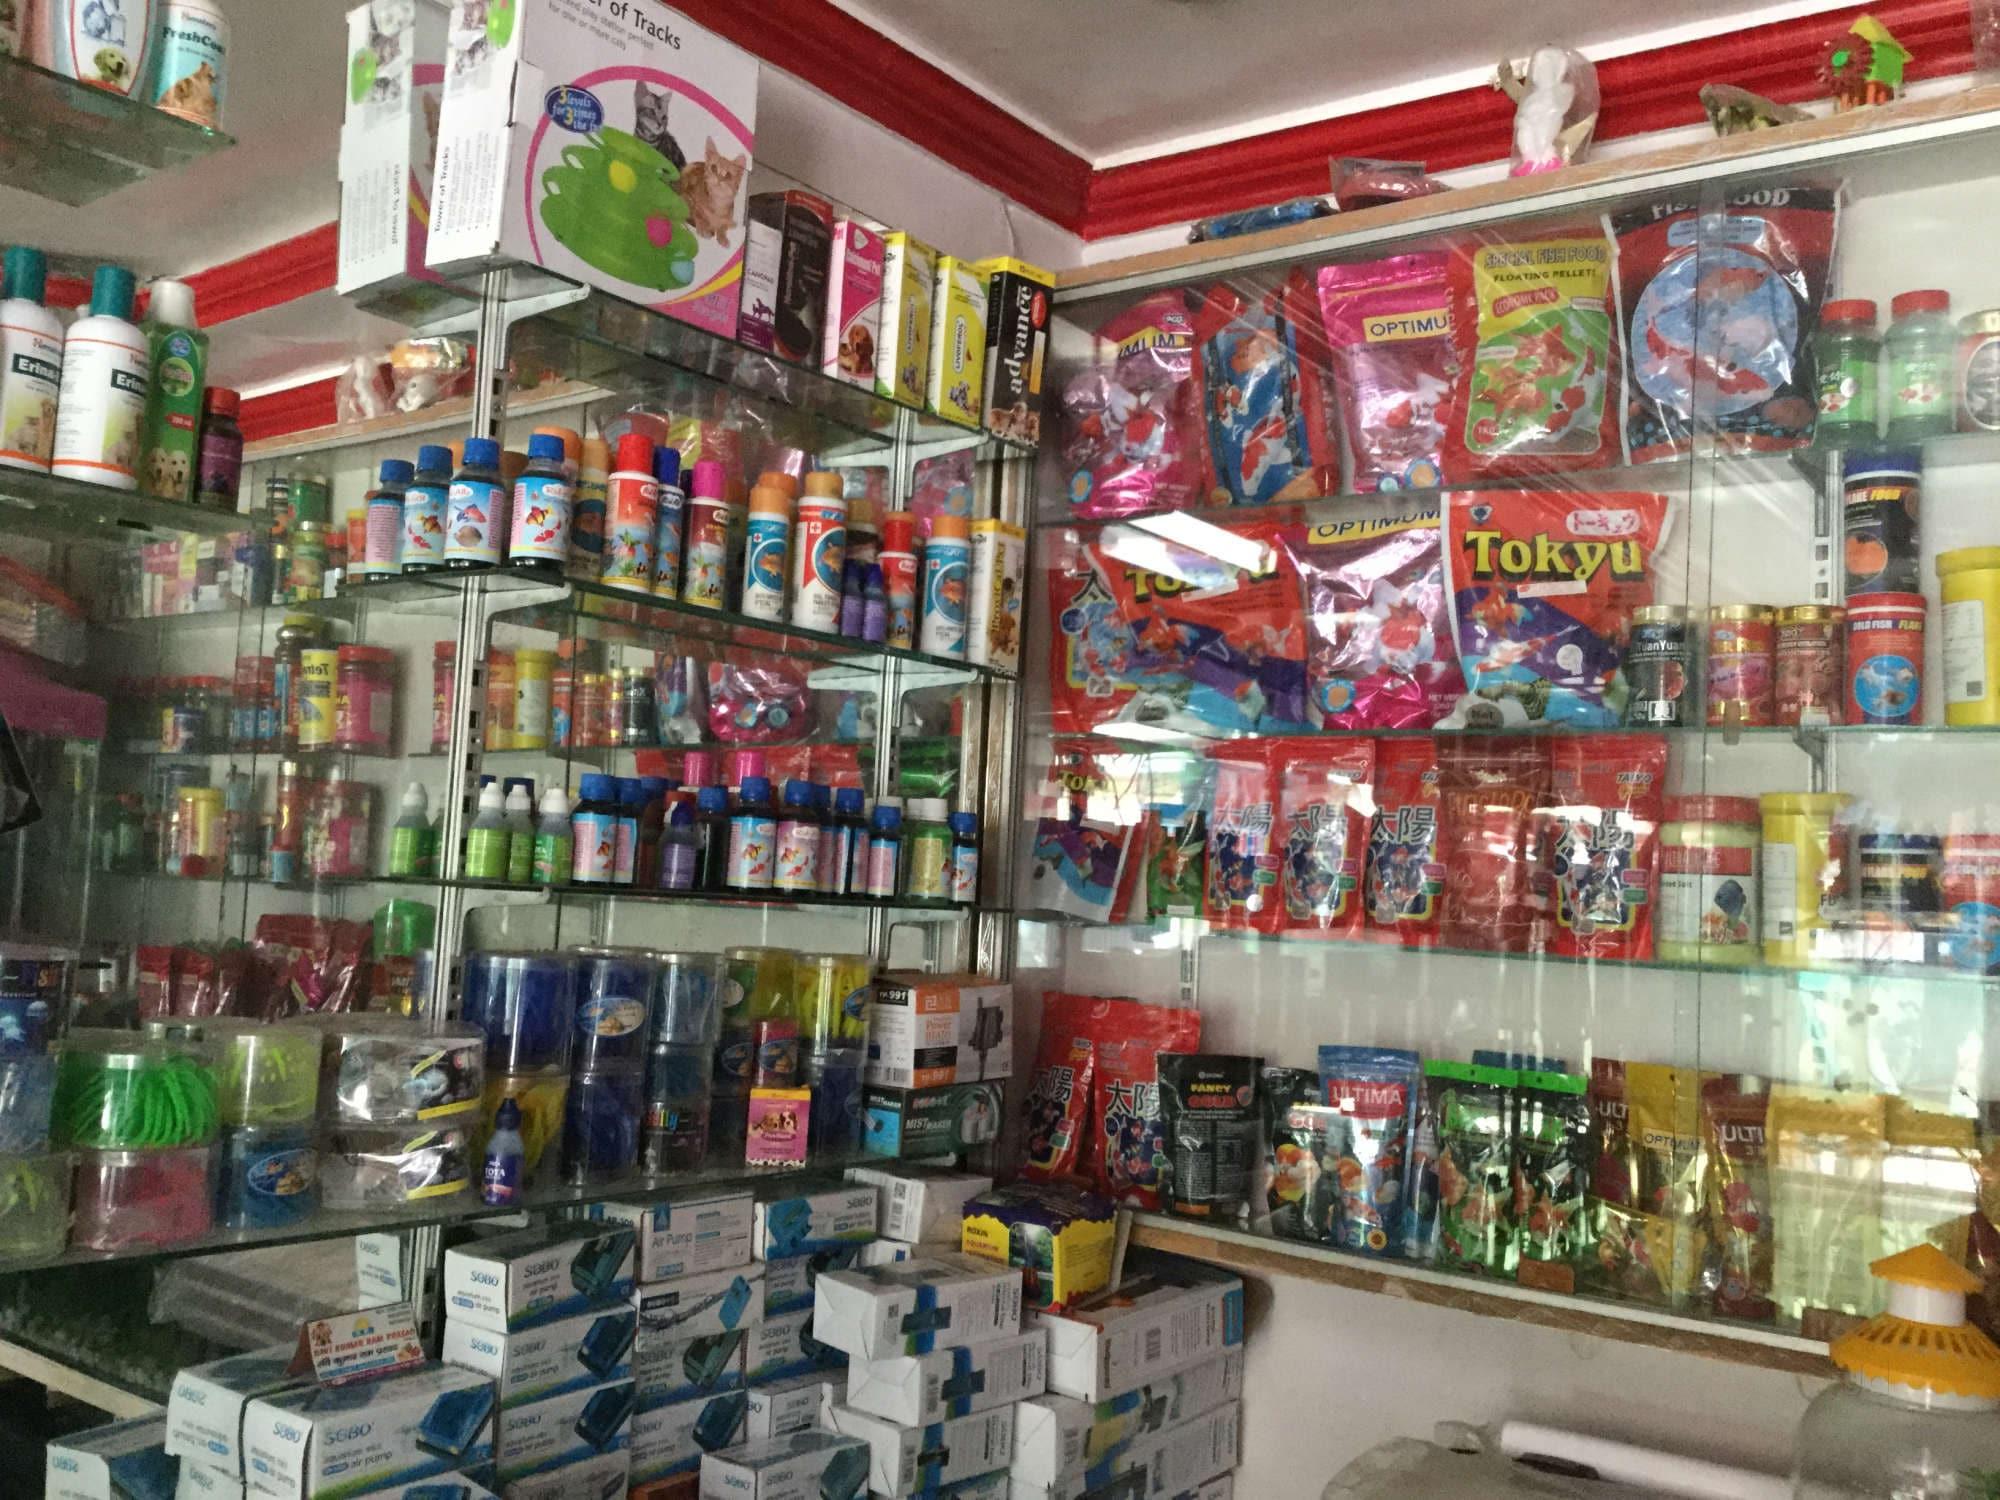 Top Aquarium Silicone Sealant Distributors in Karachi Khana, Kanpur